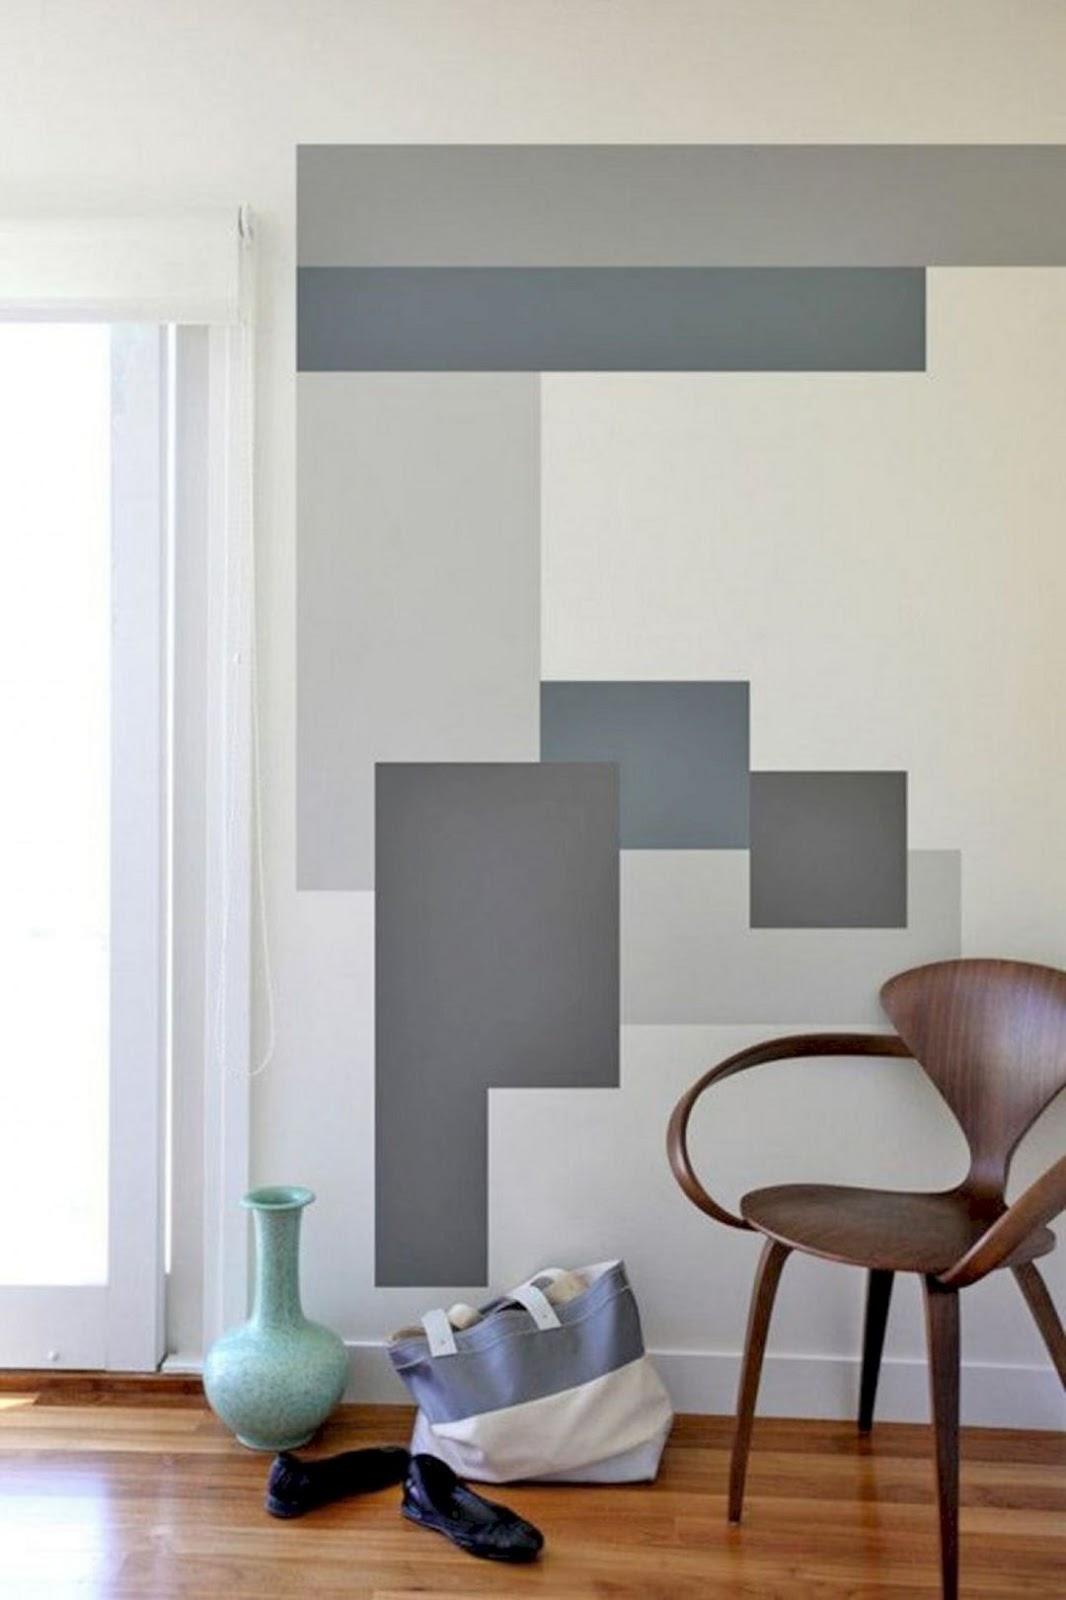 sala parede pintura geométrica cinza